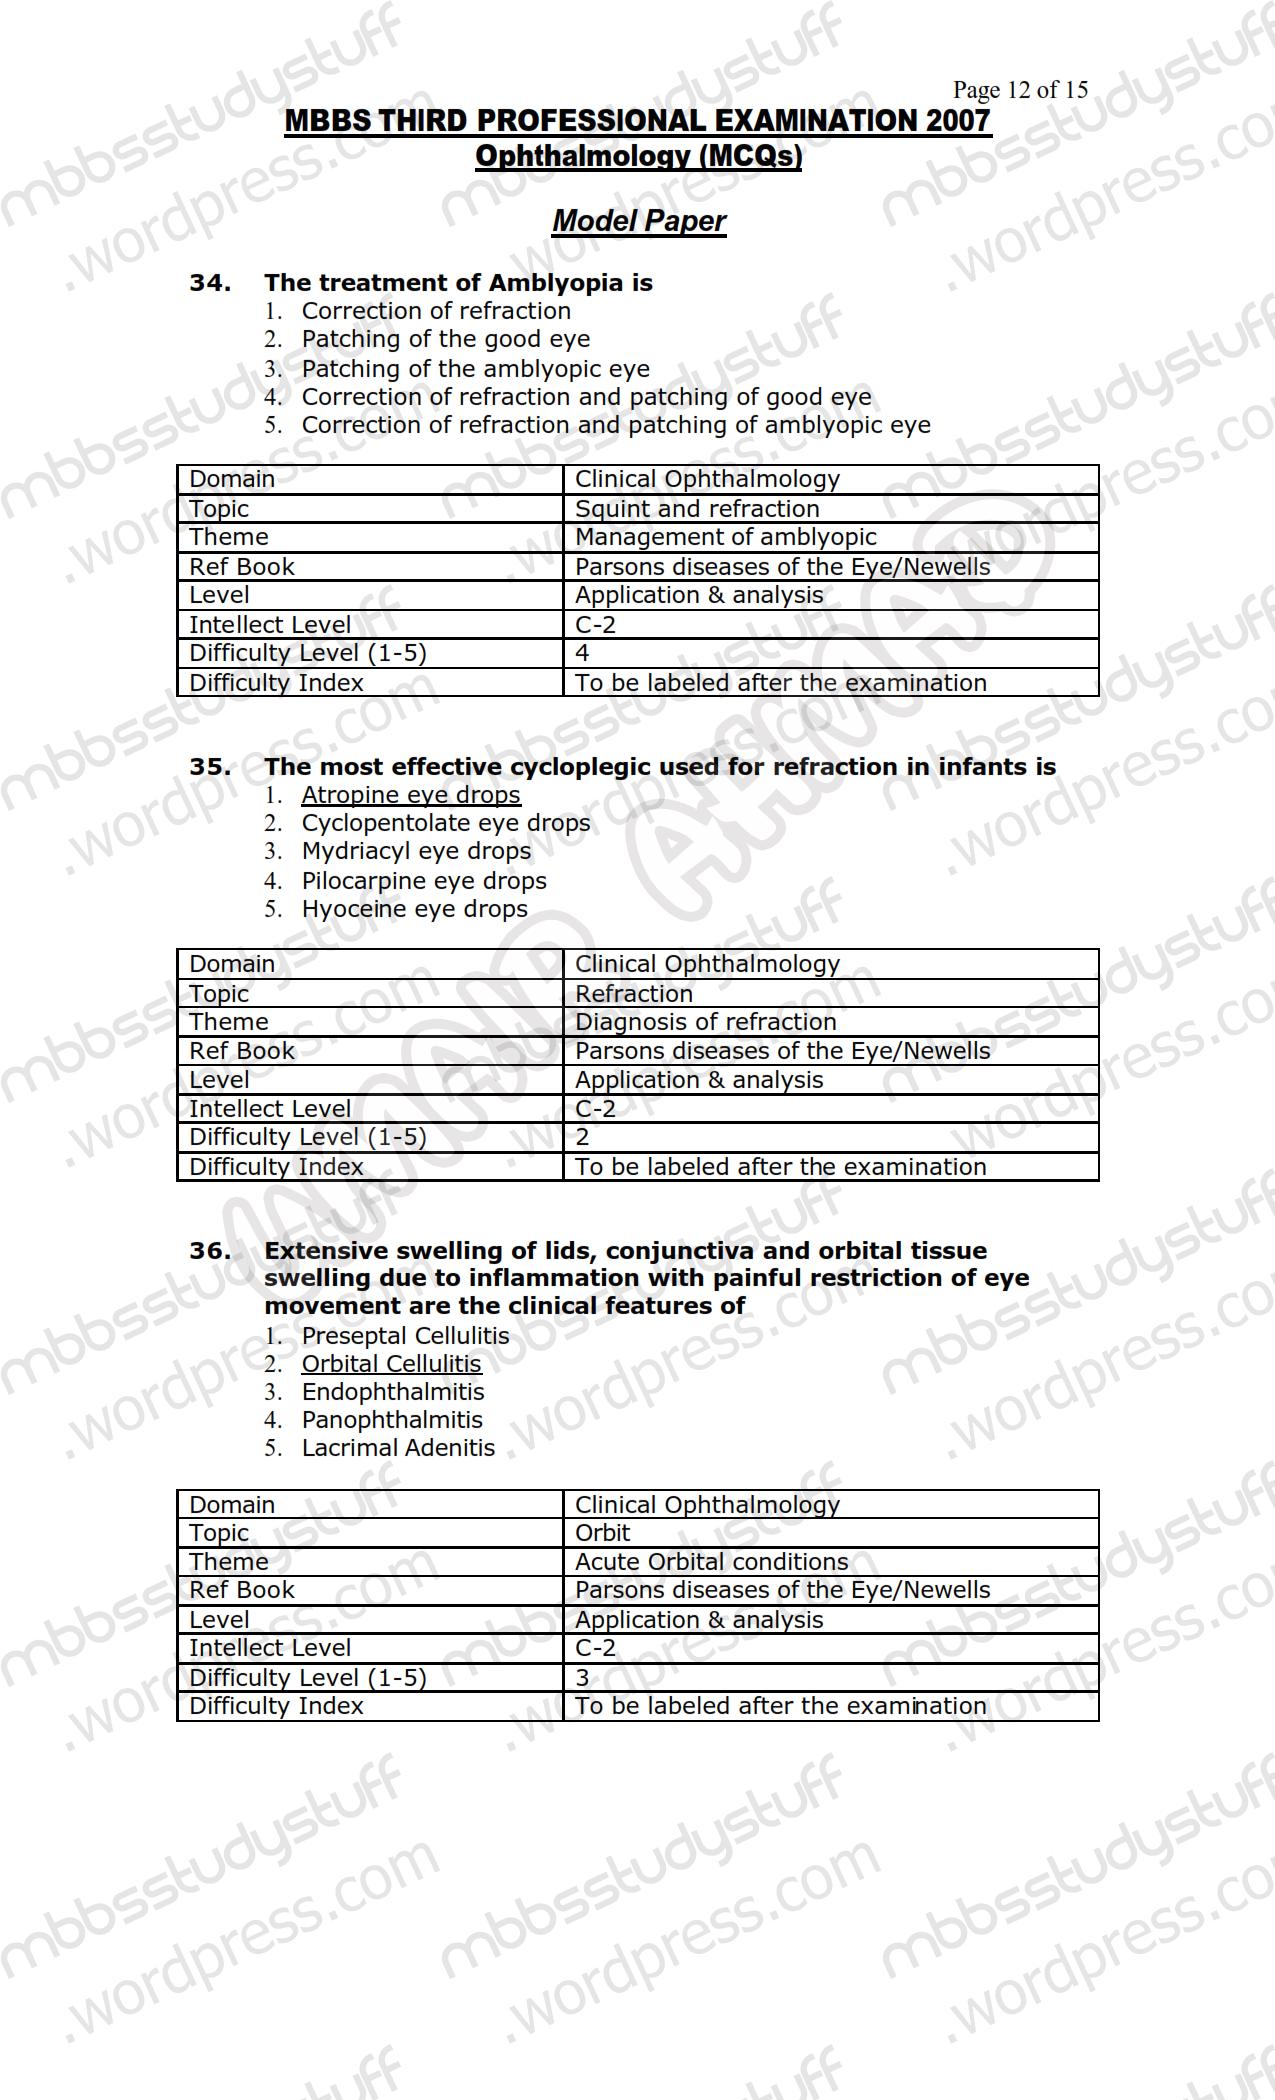 EYE MCQ MODEL PAPER 2007 | MBBS Study Stuff